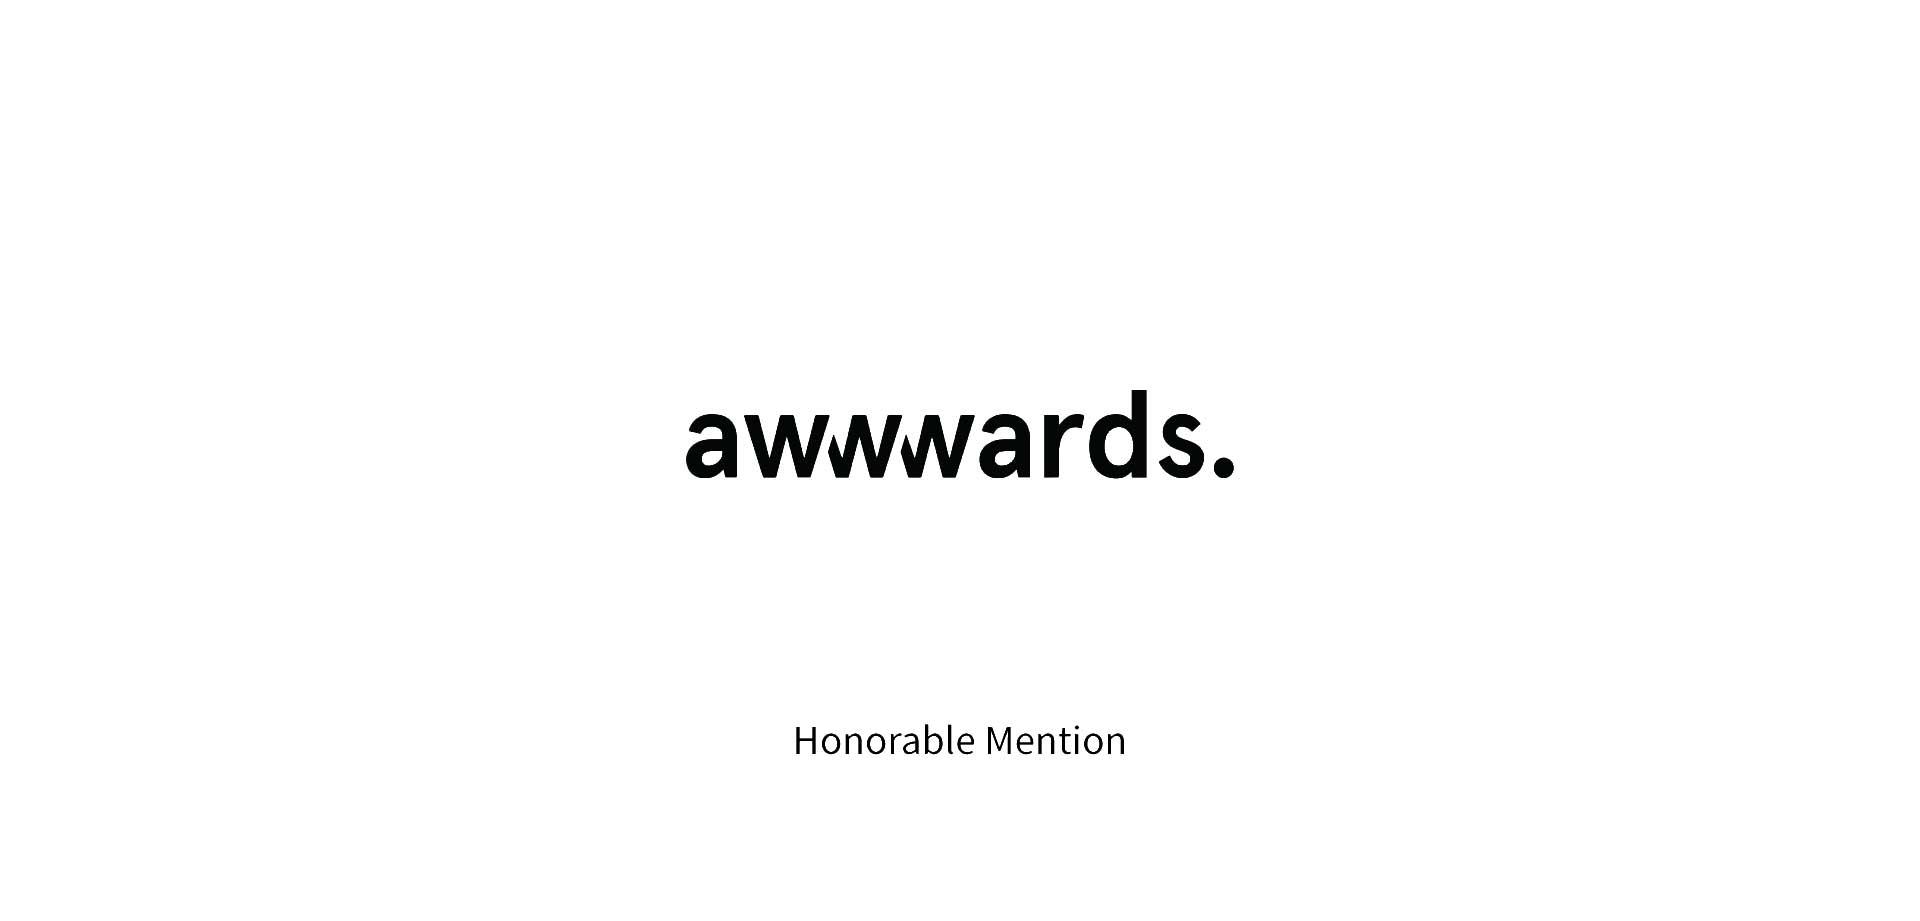 edd-detailpage-award-banner-v04.jpg